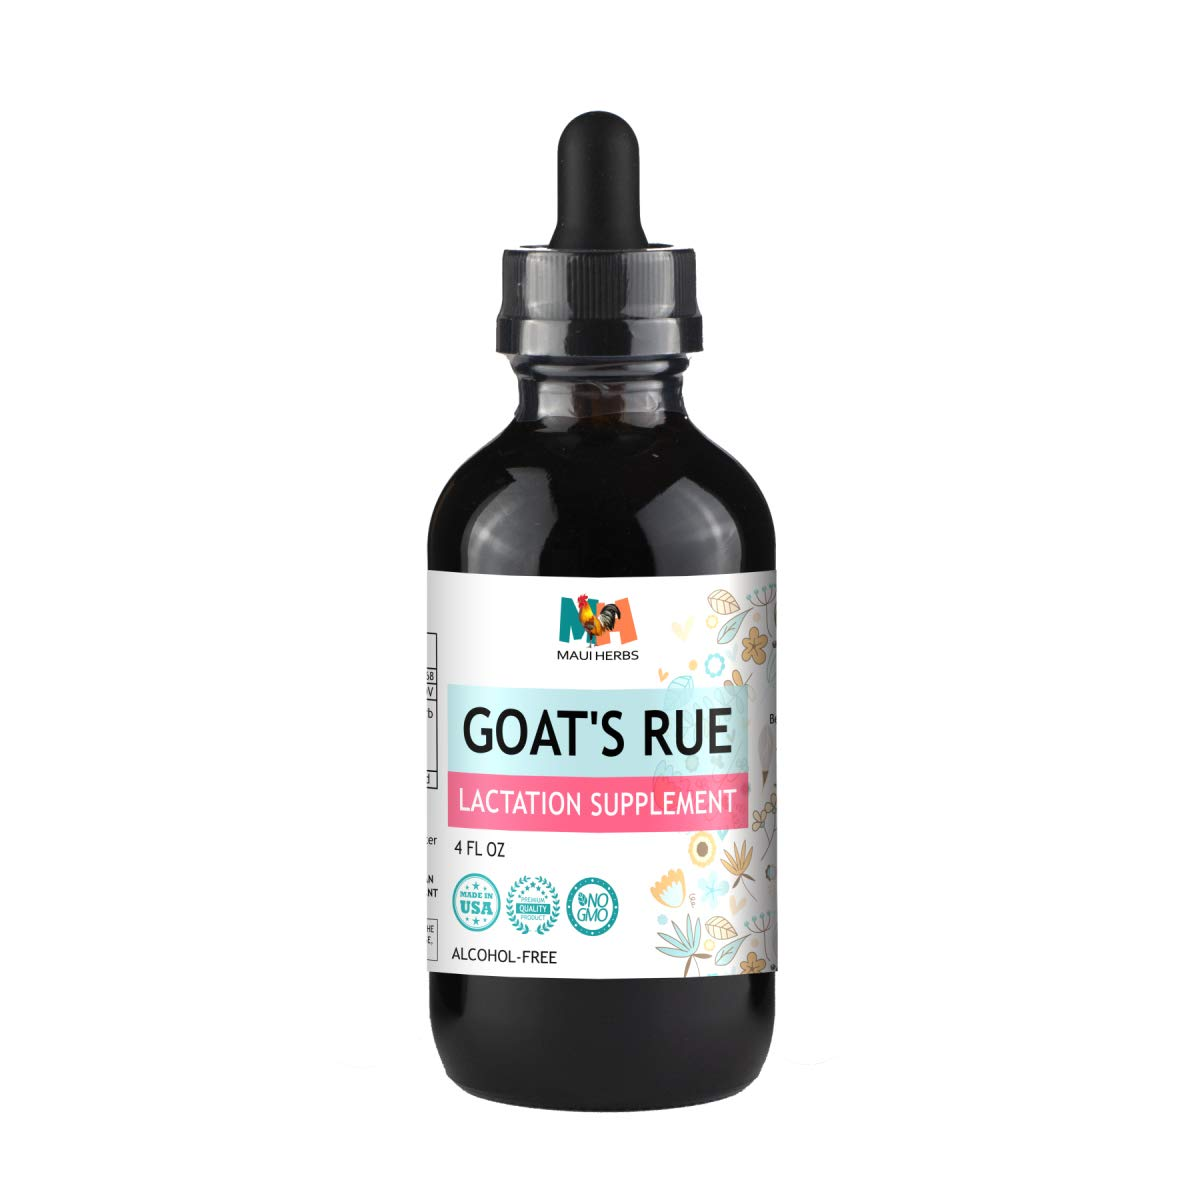 Goat s Rue Tincture Alcohol-Free Liquid Extract, Organic Goat s Rue Herb Galega officinalis 4 FL OZ